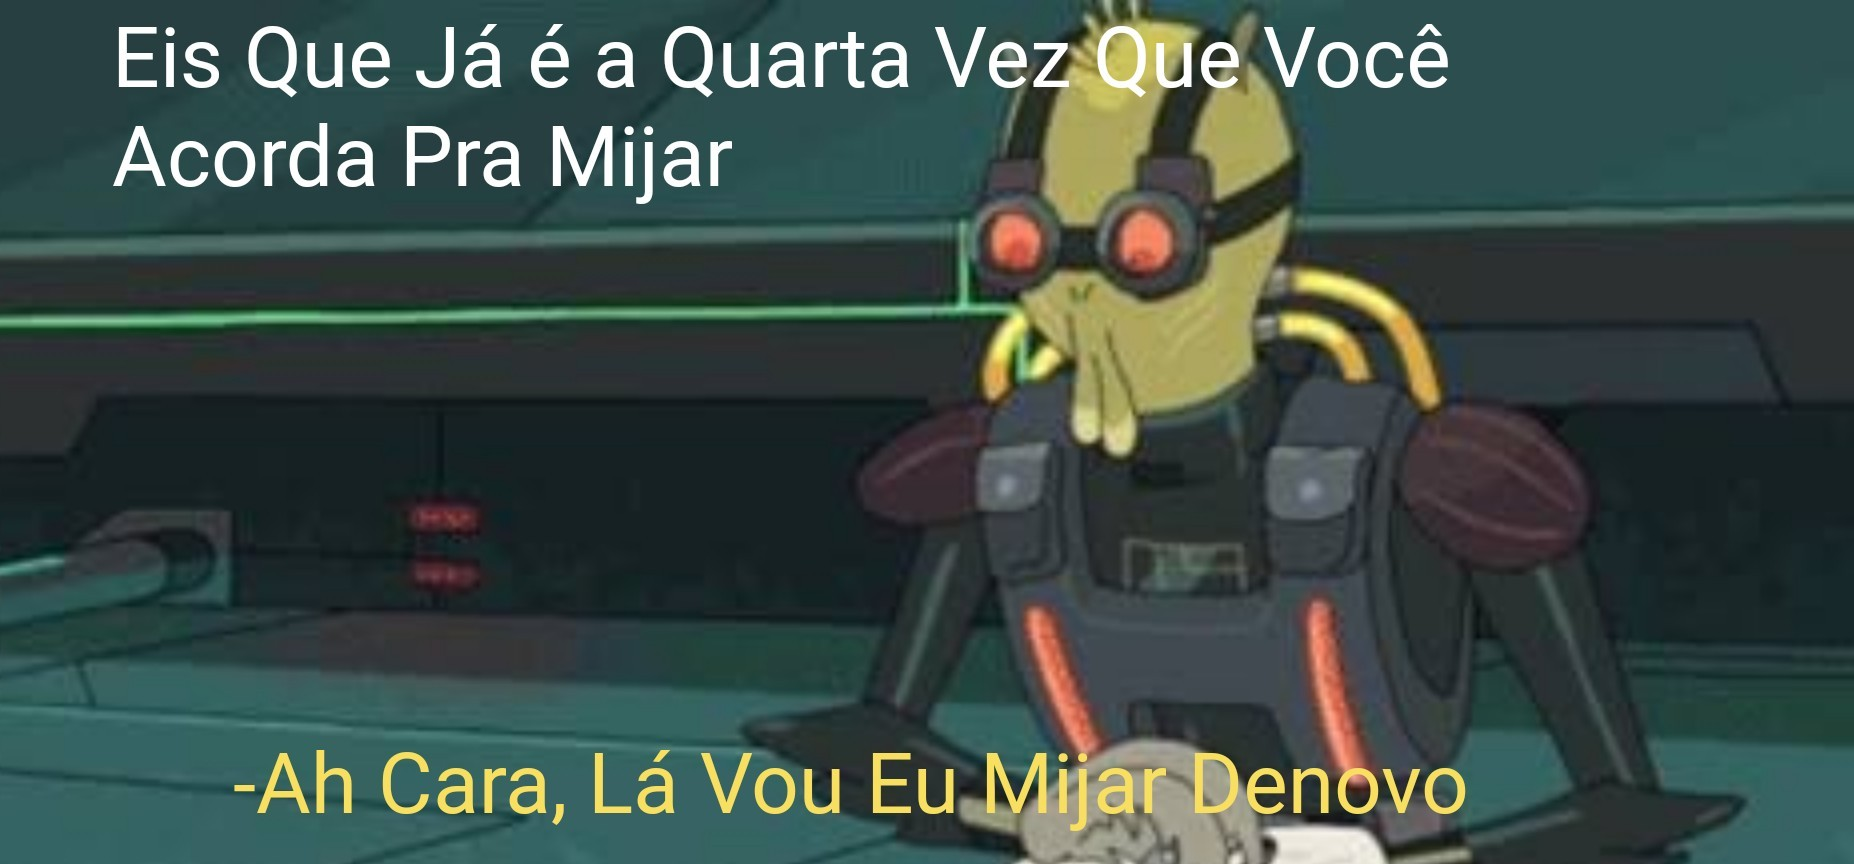 Oh Boy! - meme